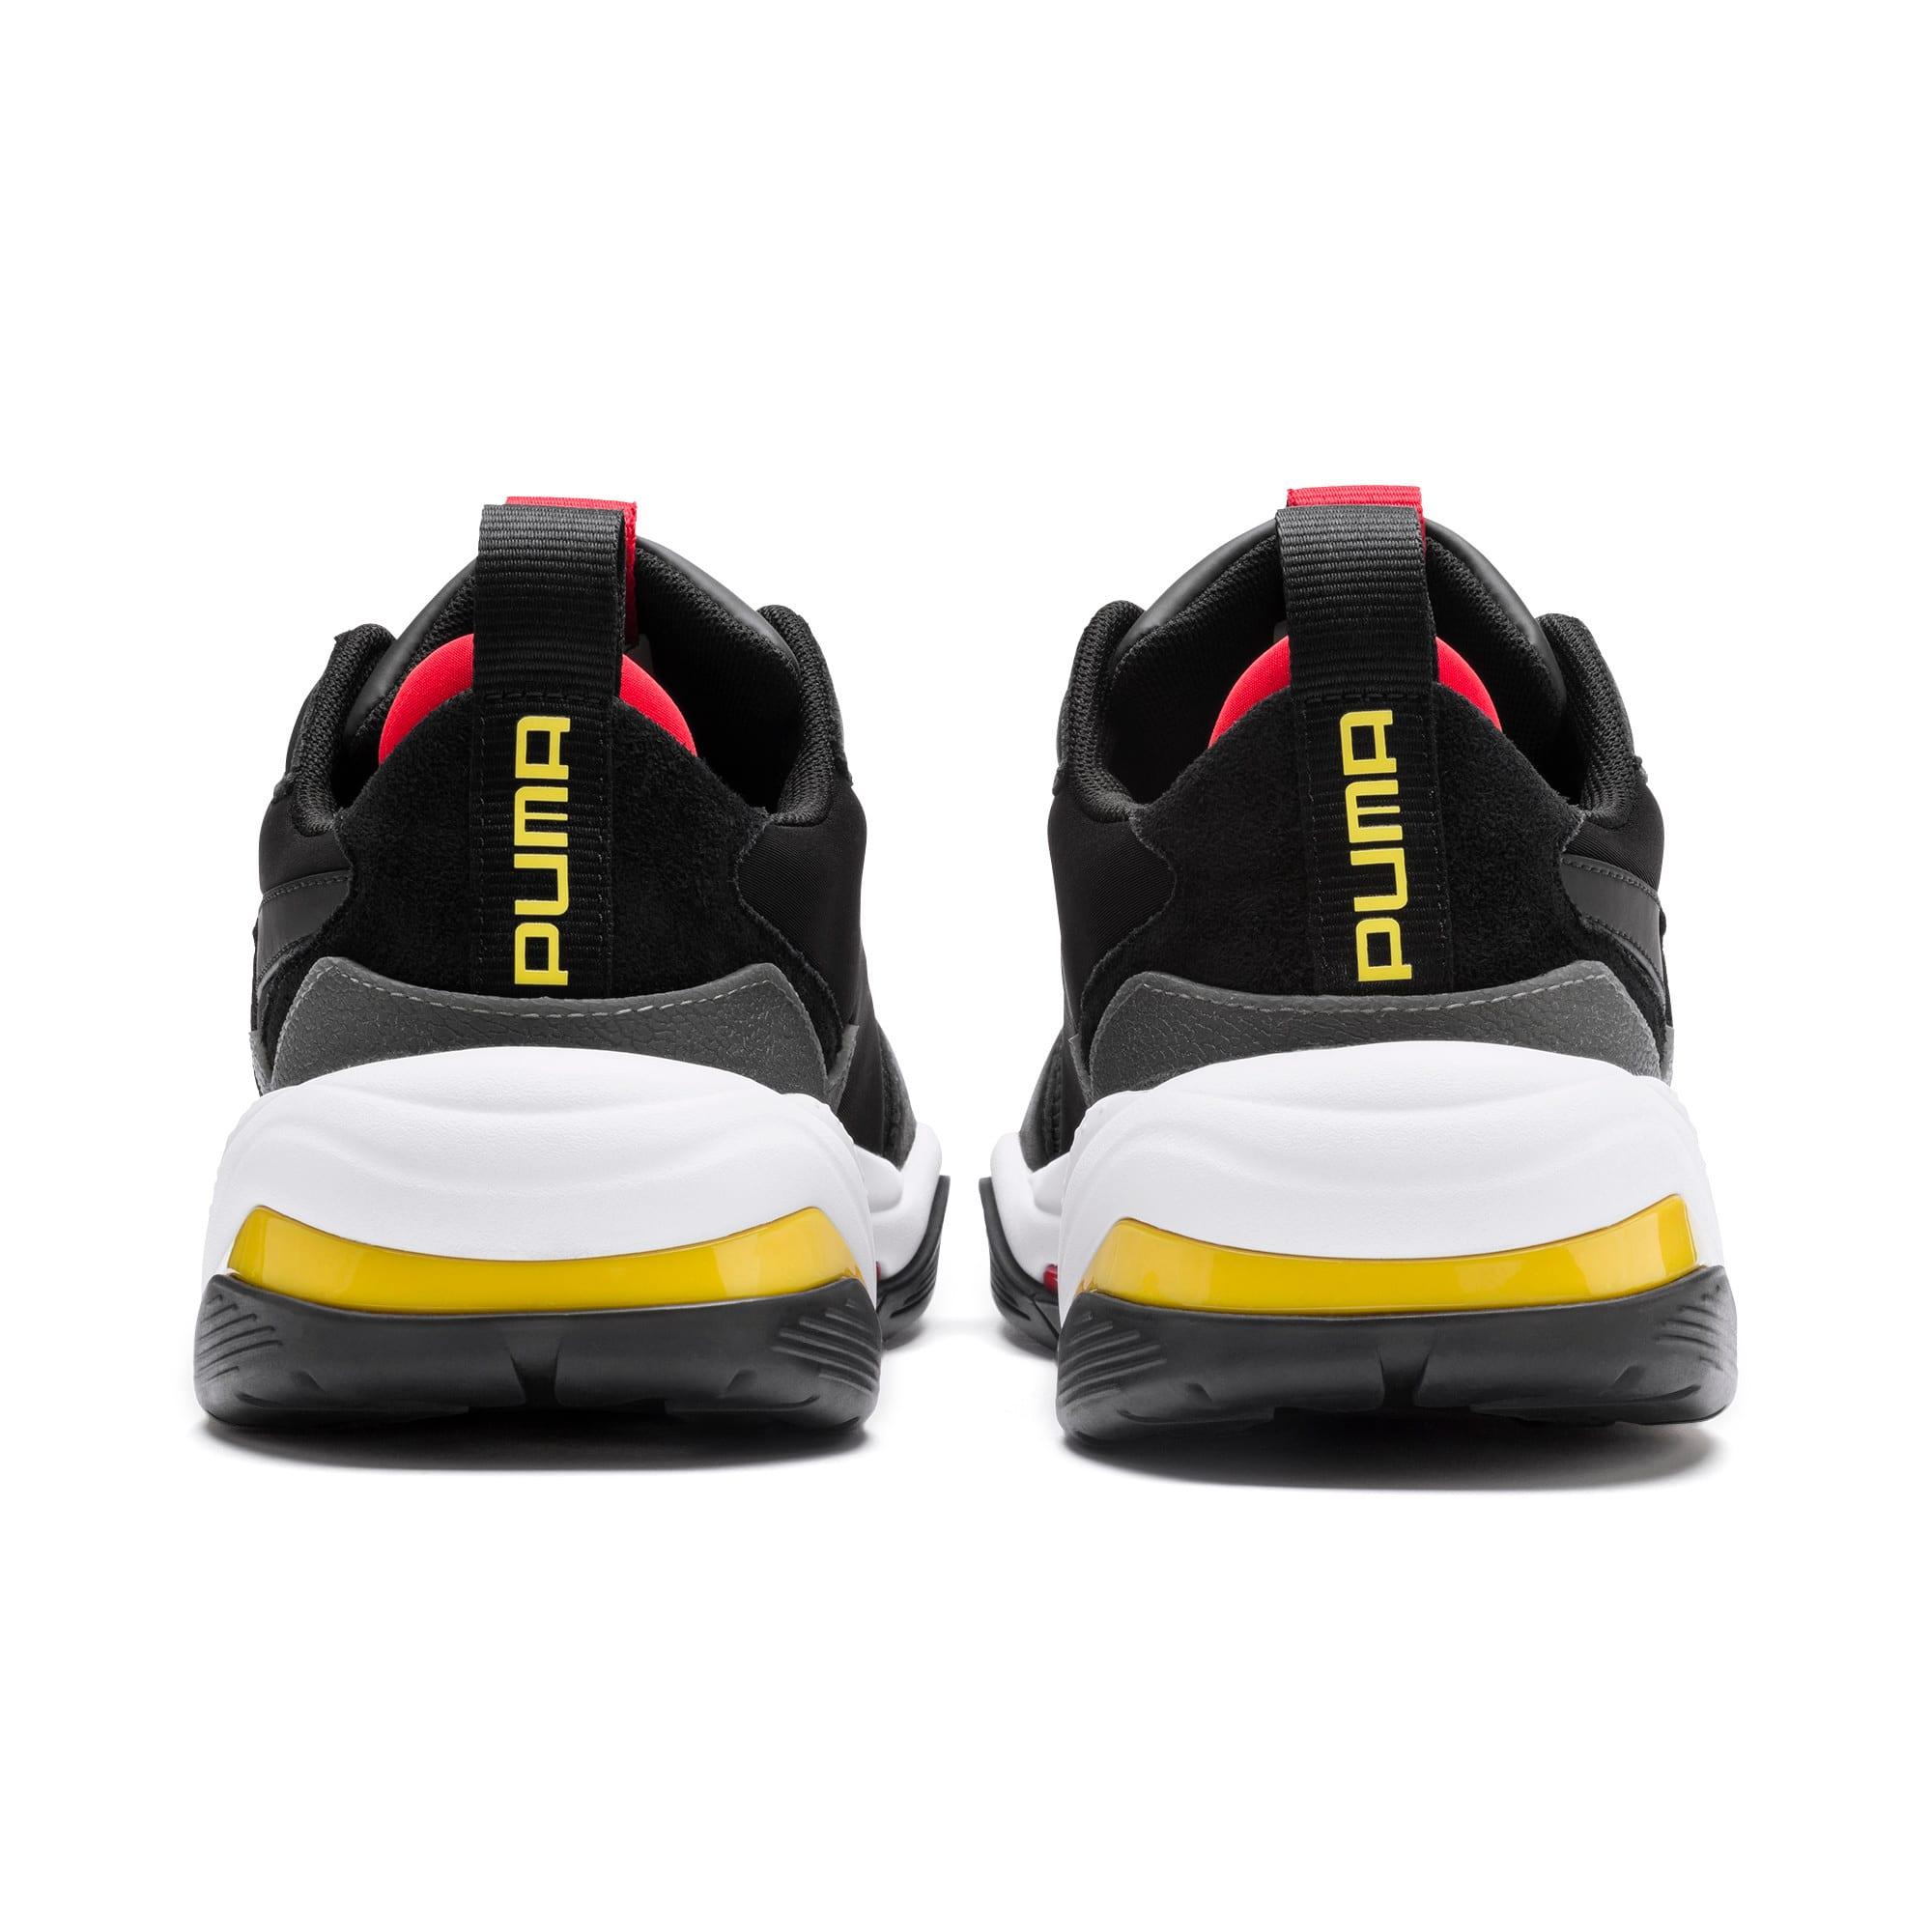 Thumbnail 3 of Ferrari Thunder Trainers, Puma Black-Rosso Corsa, medium